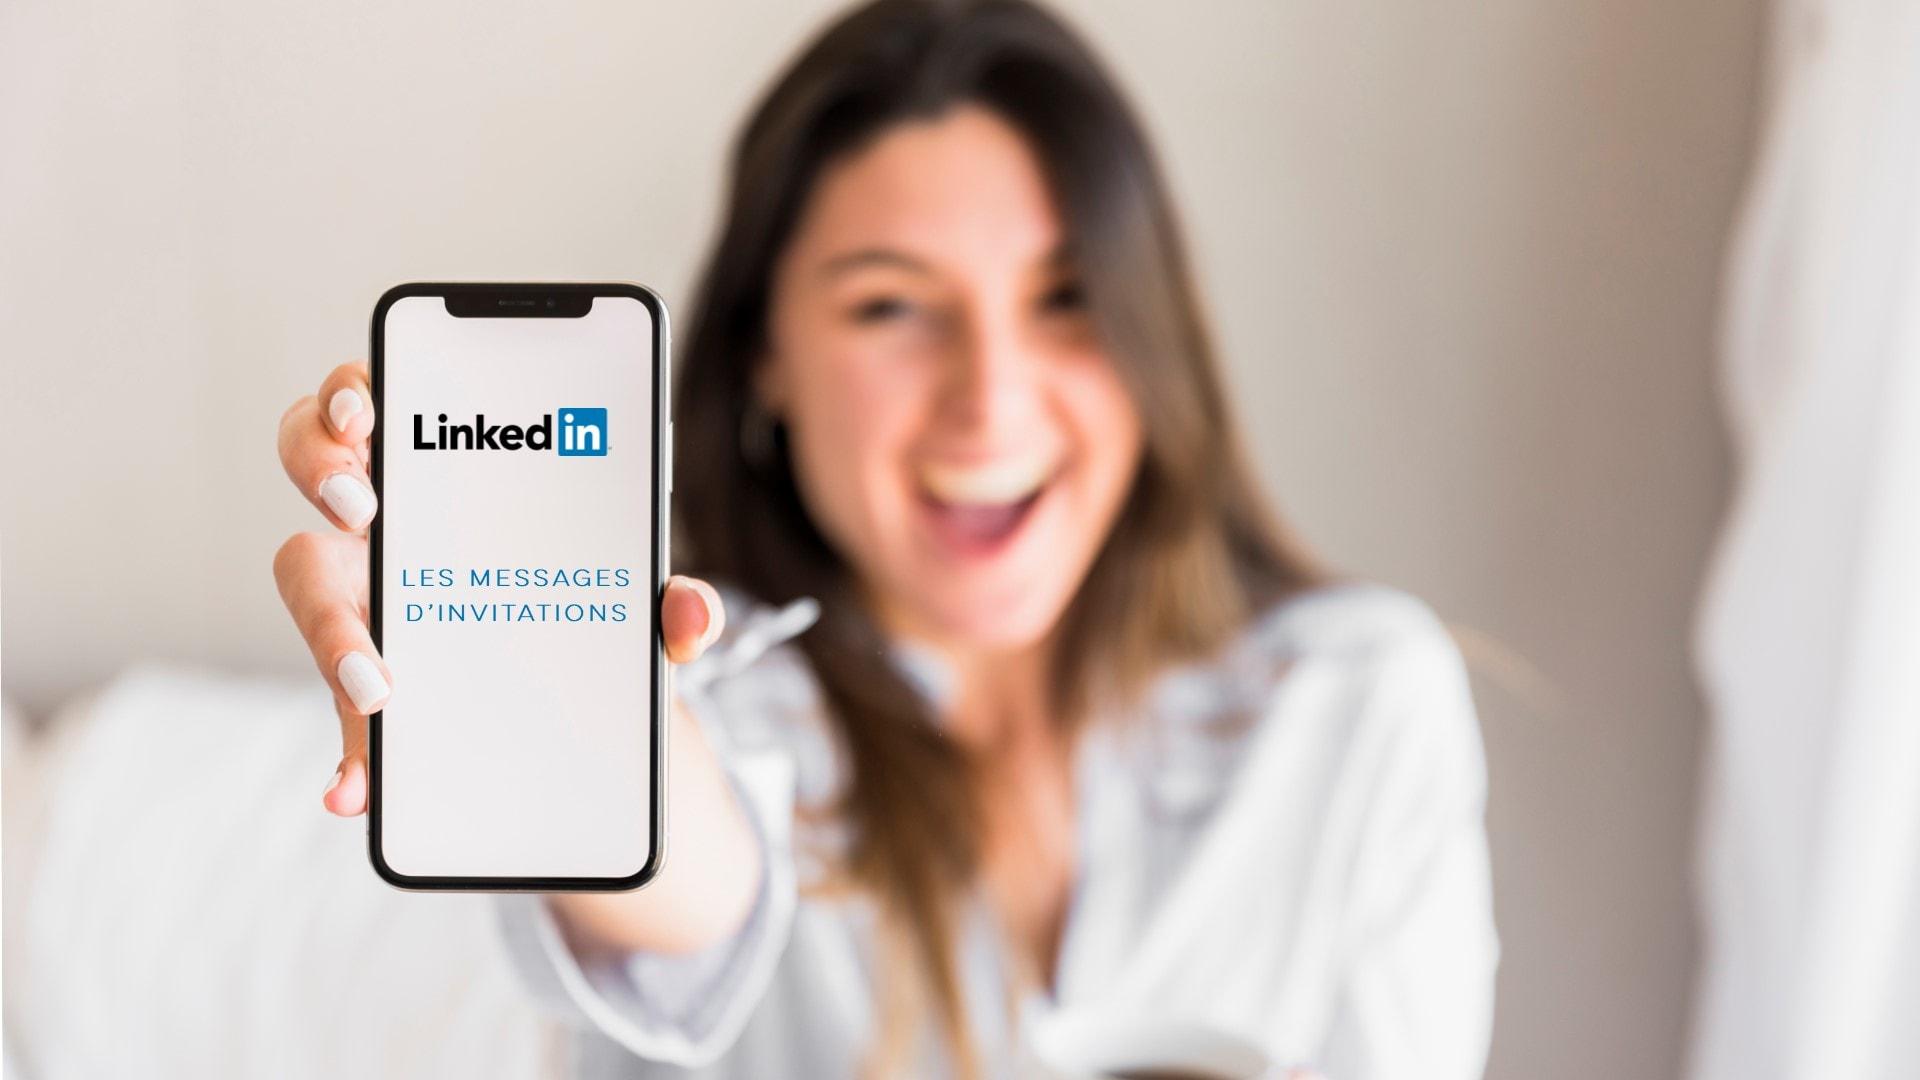 Message Invitation LinkedIn : exemple et conseils - Linkinfluent